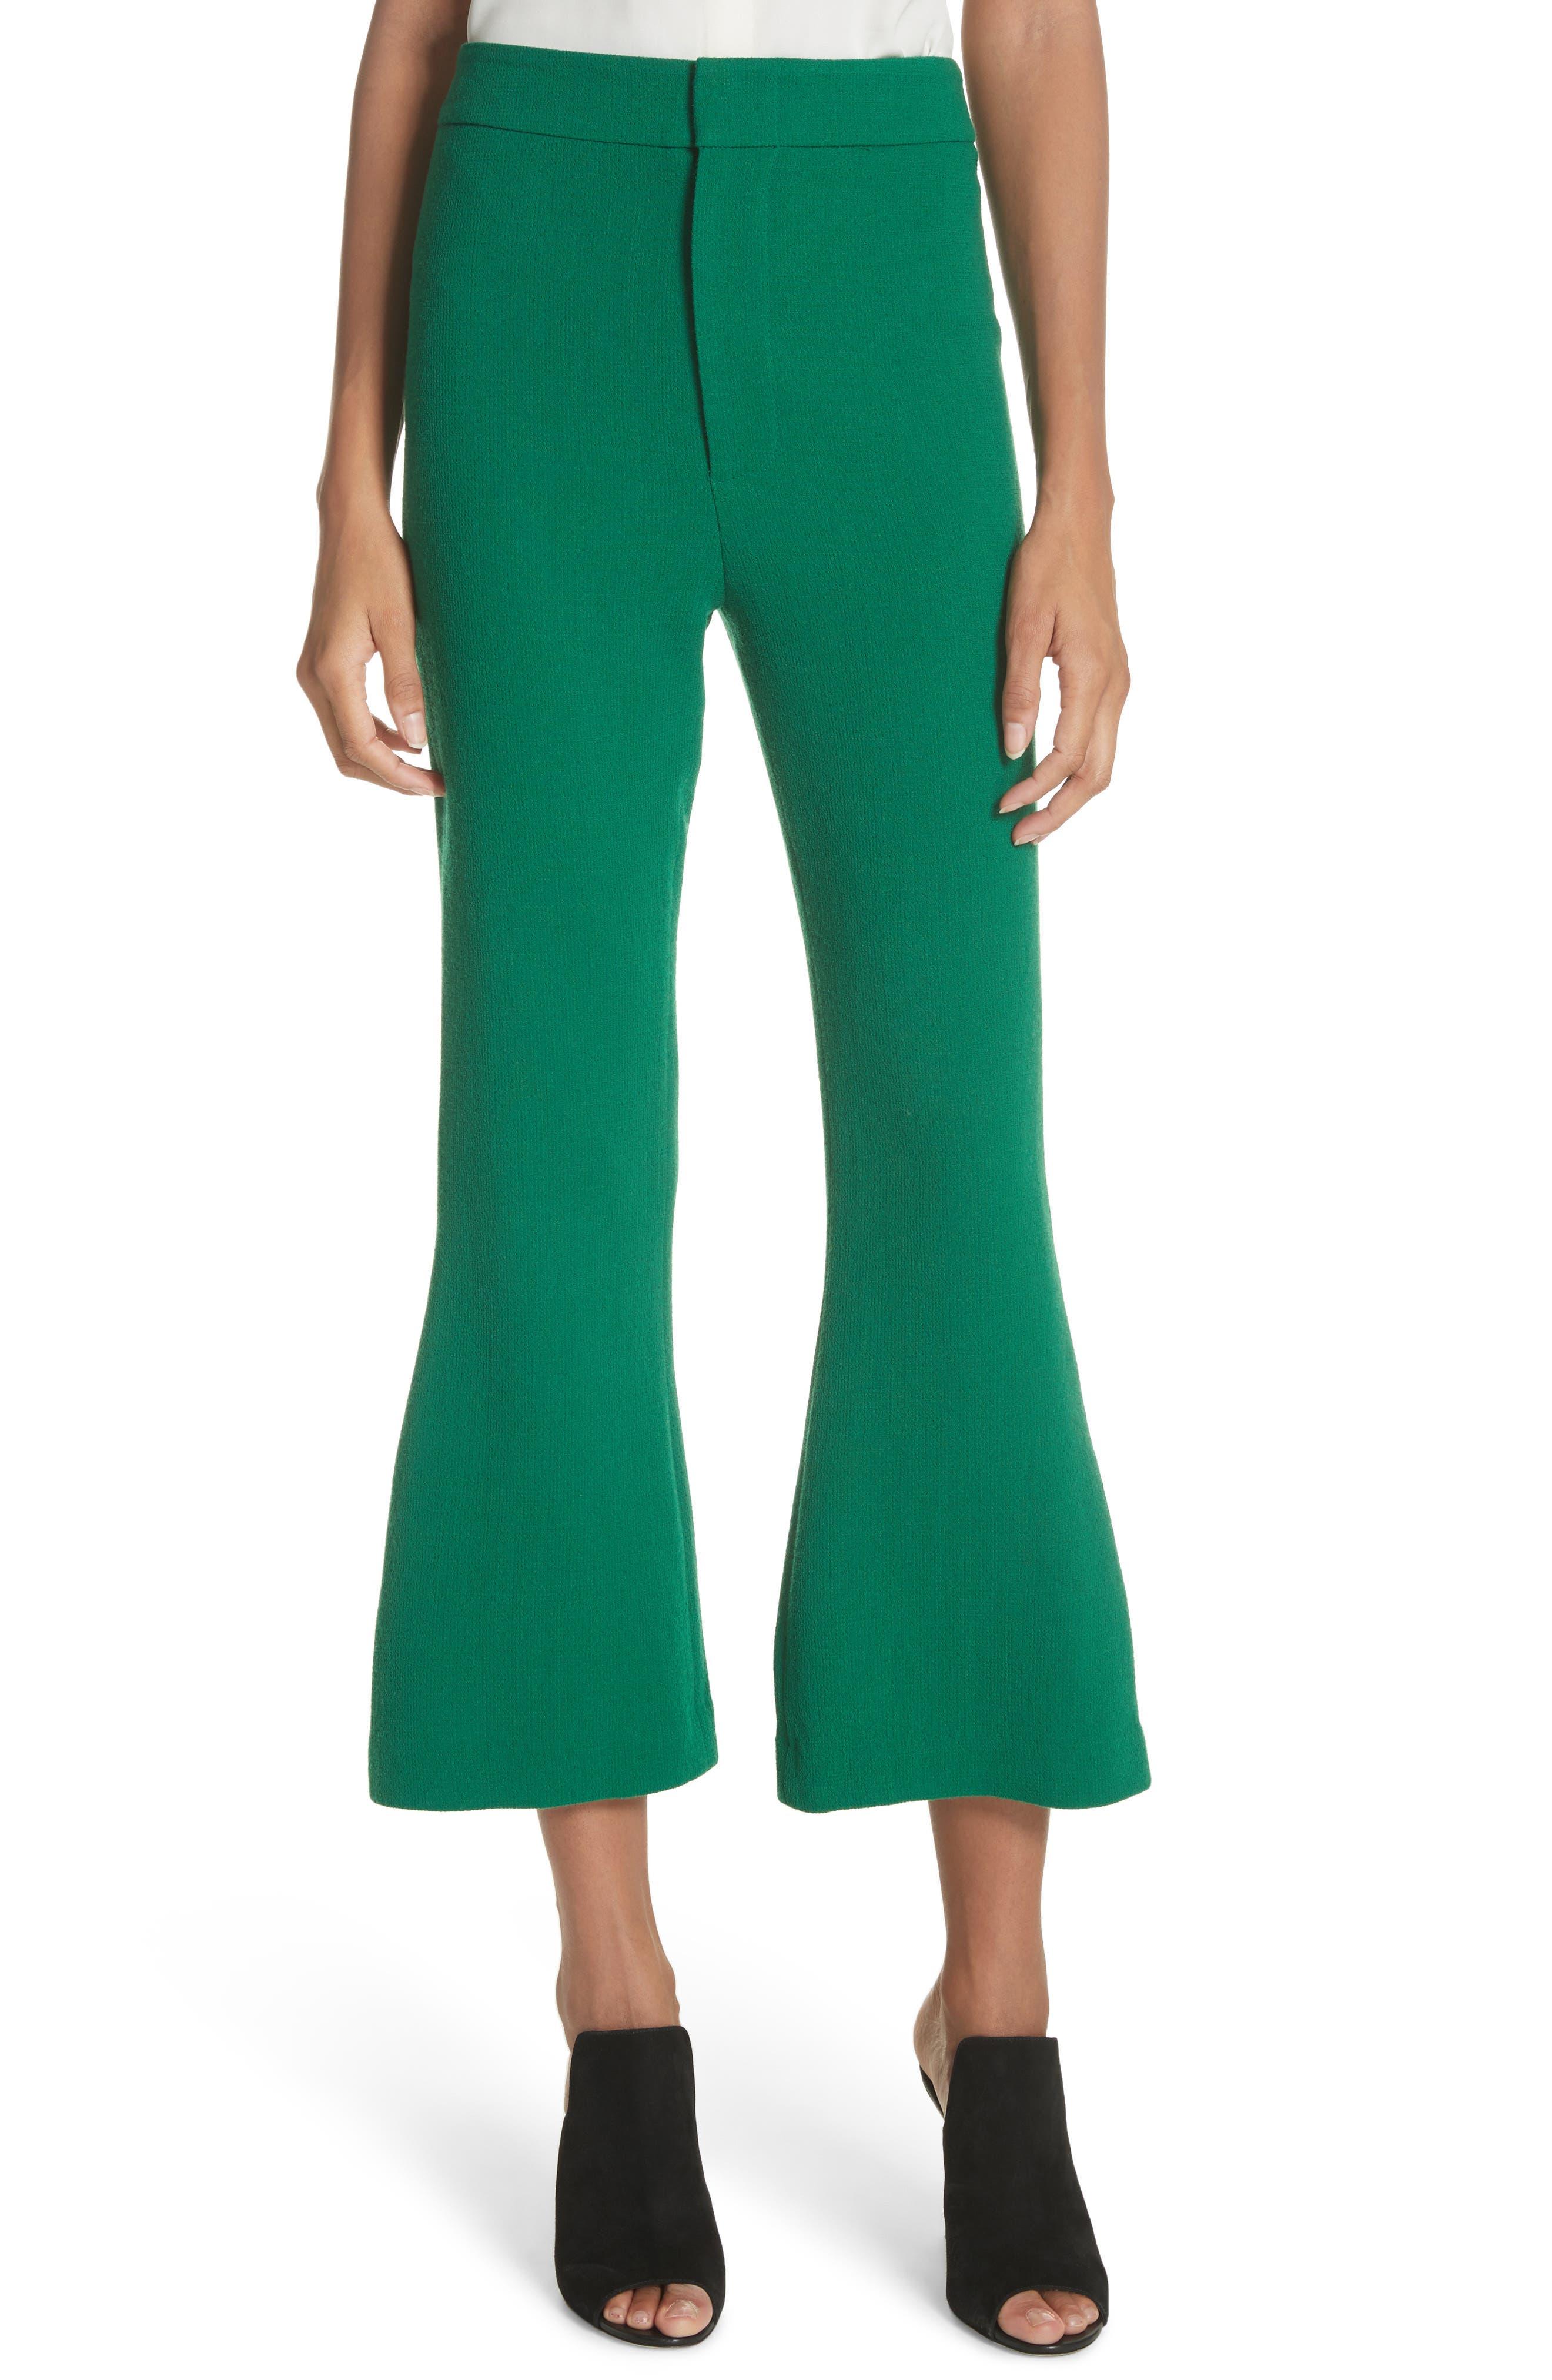 Smythe Crop Flare Pants